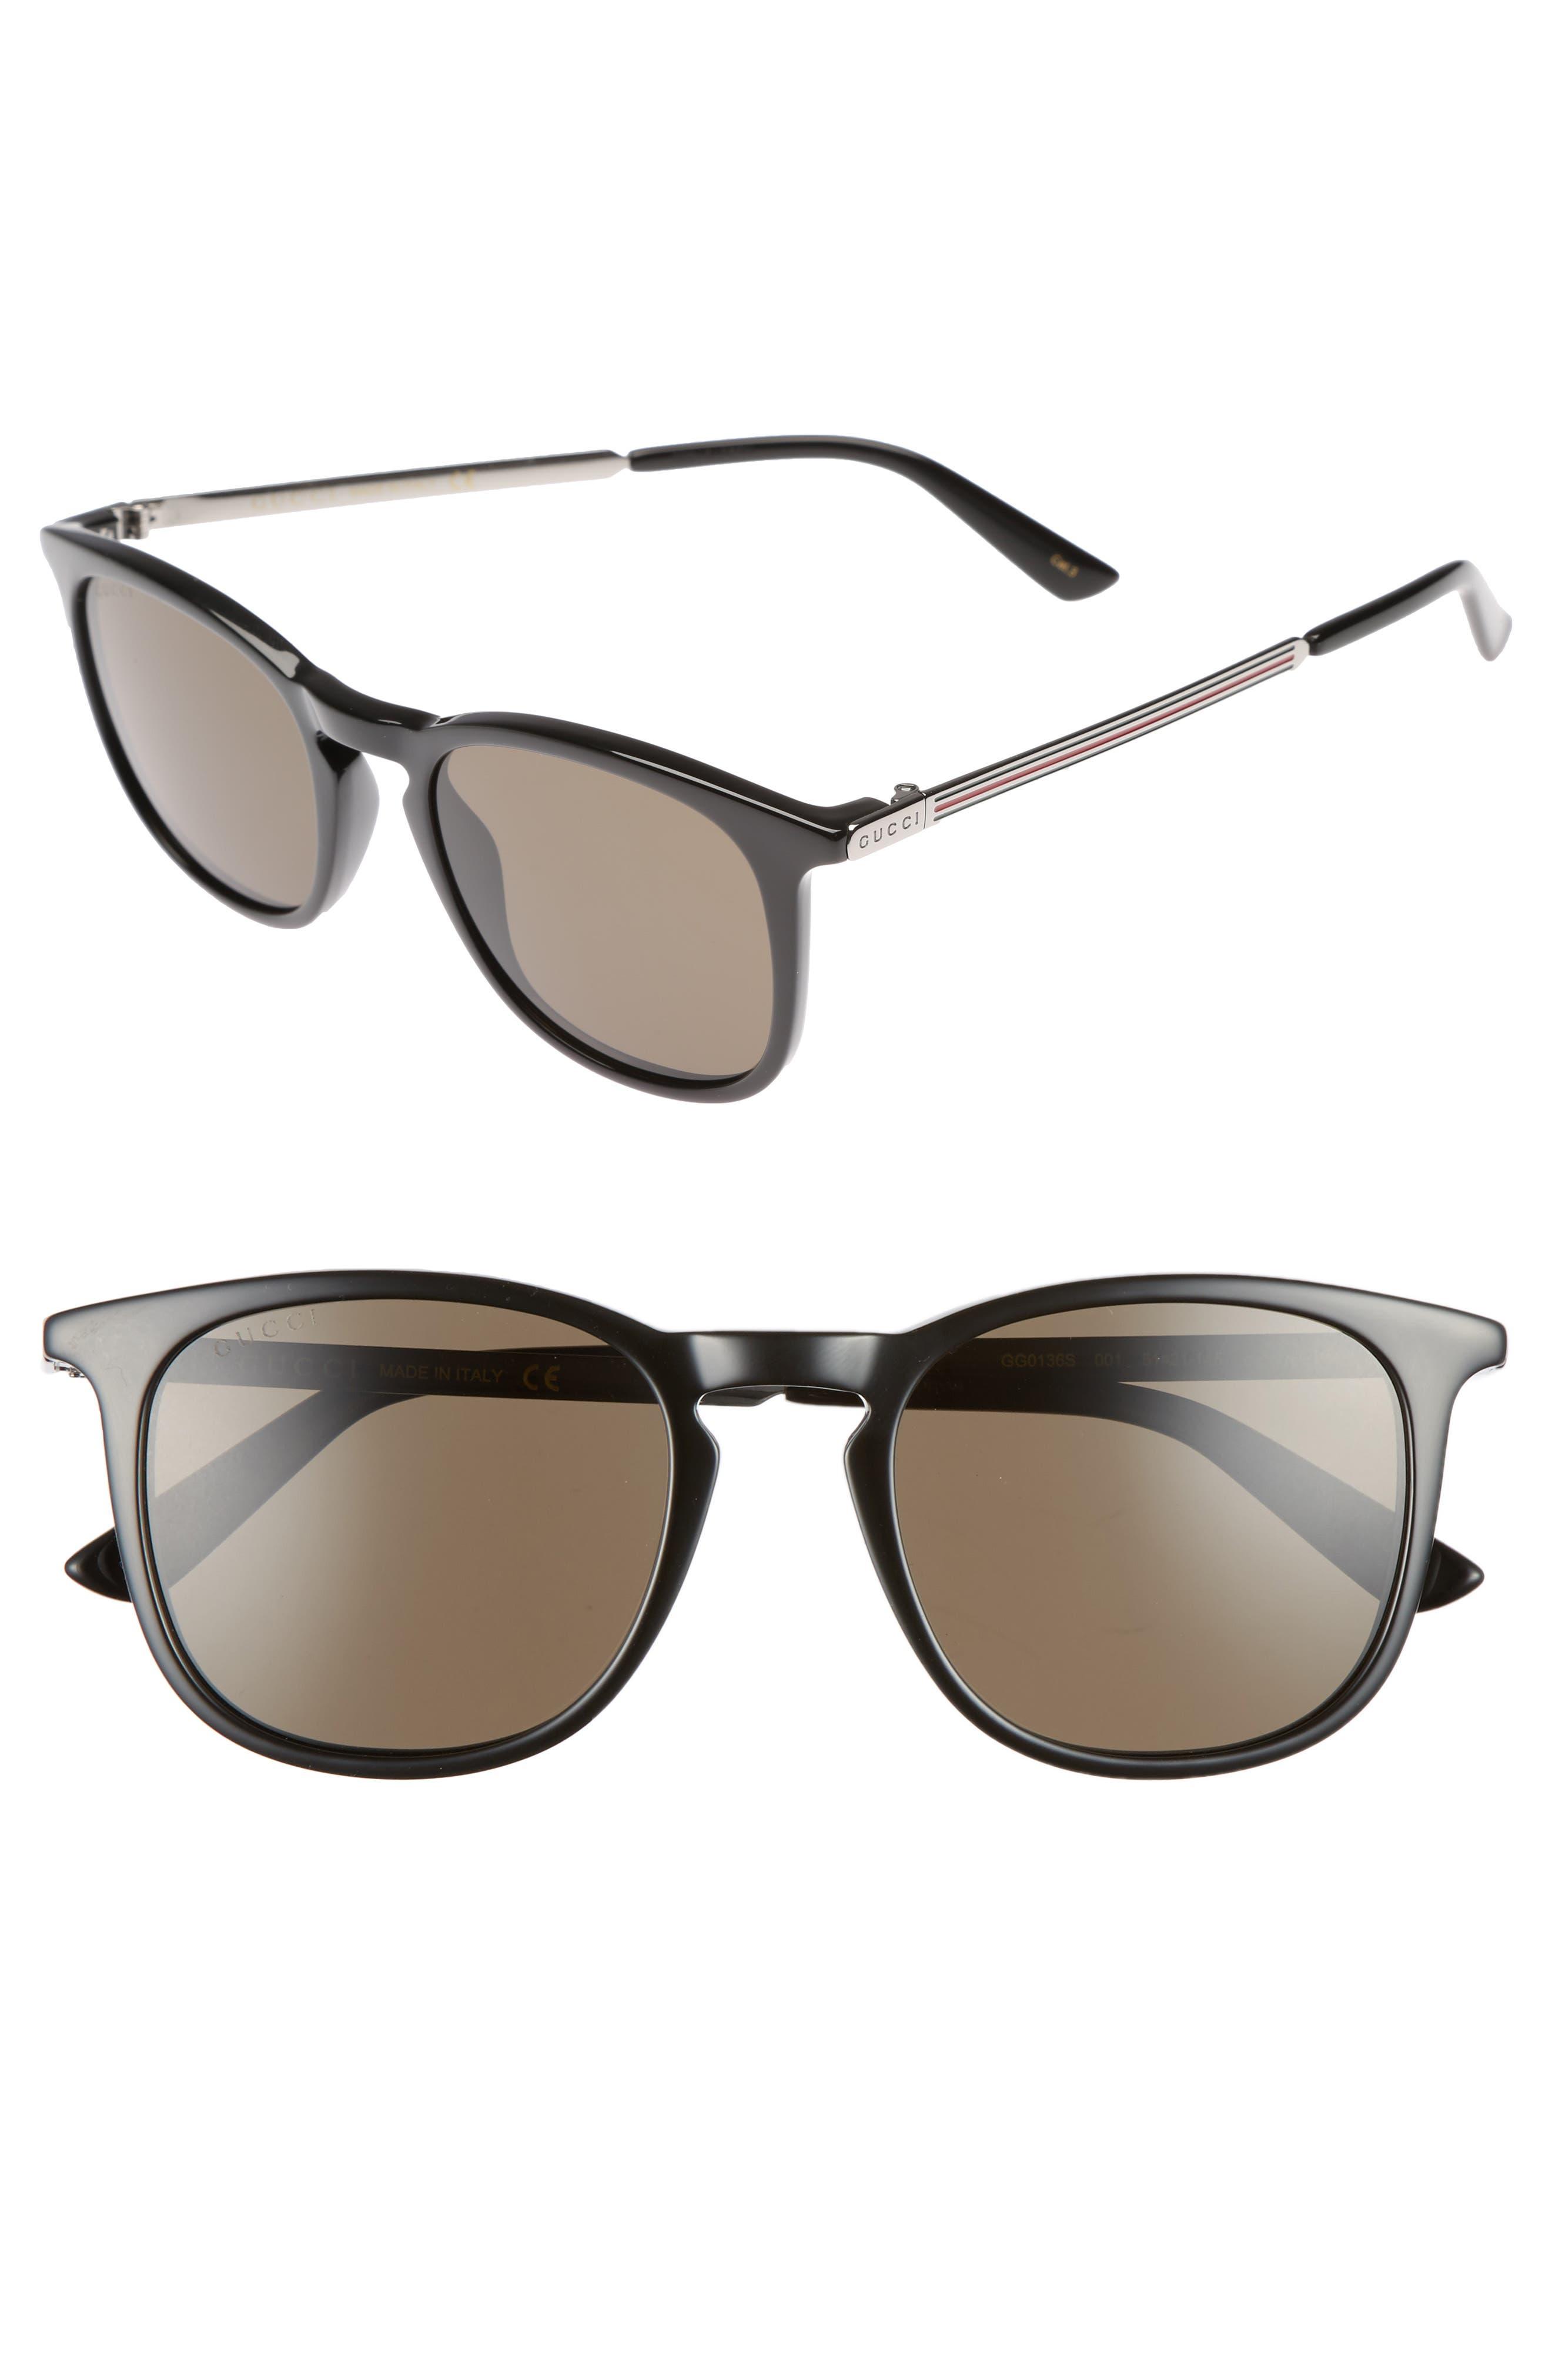 Optyl 51mm Sunglasses,                         Main,                         color, Black